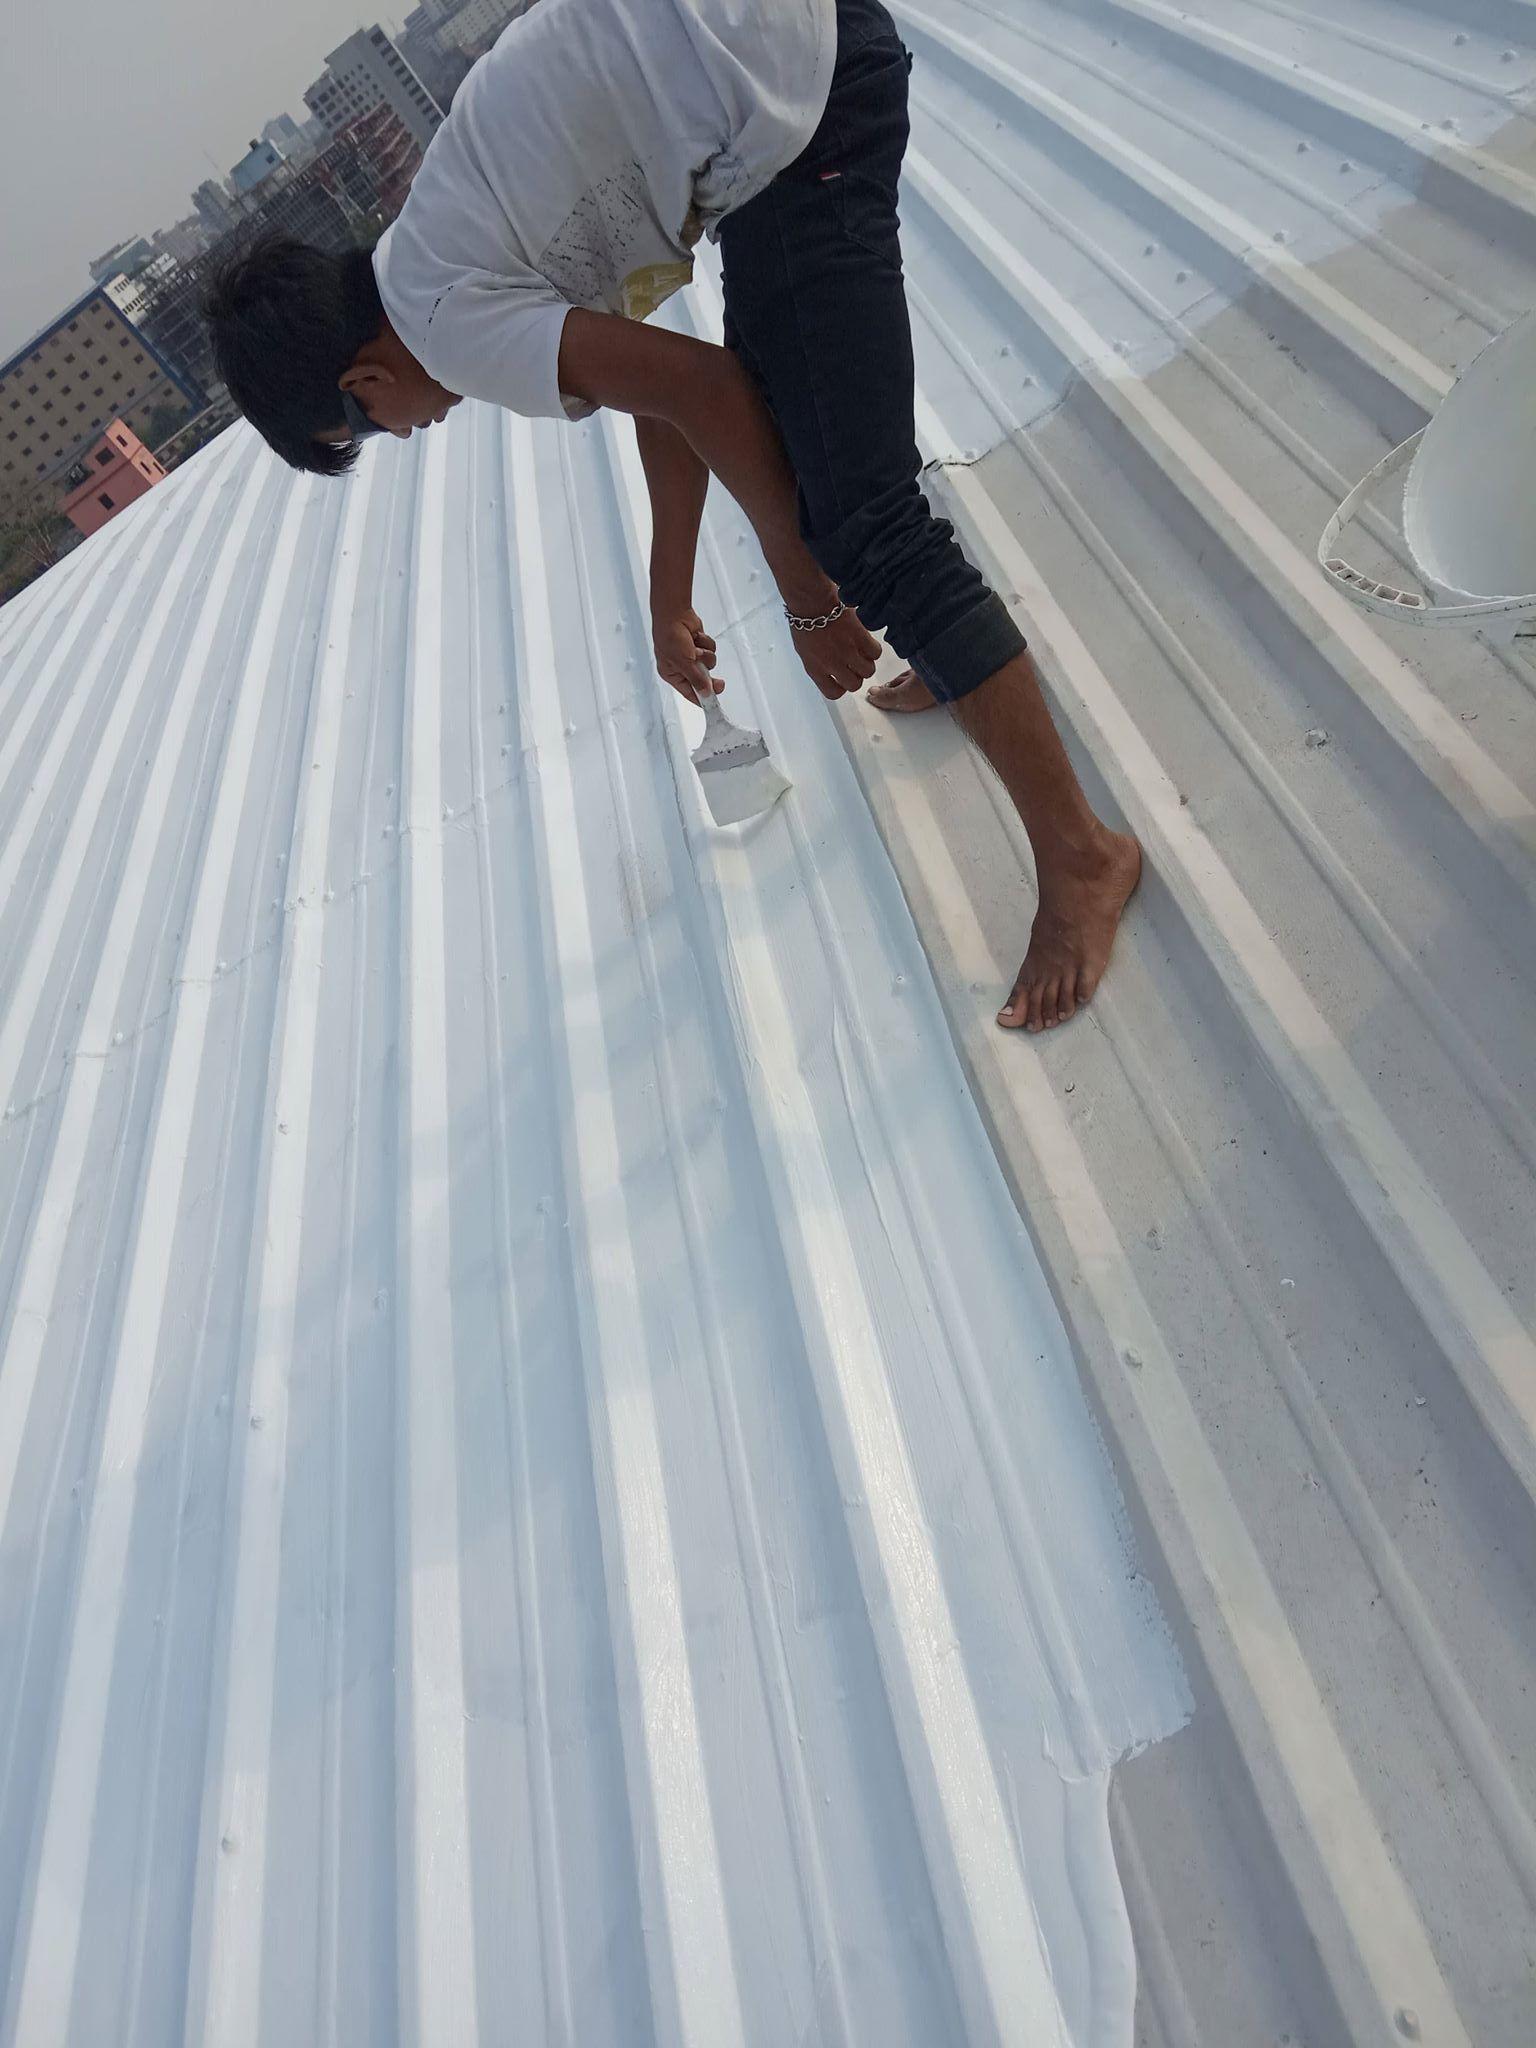 Waterproofing Solution Roof Coating Roof Waterproofing Roofing Systems